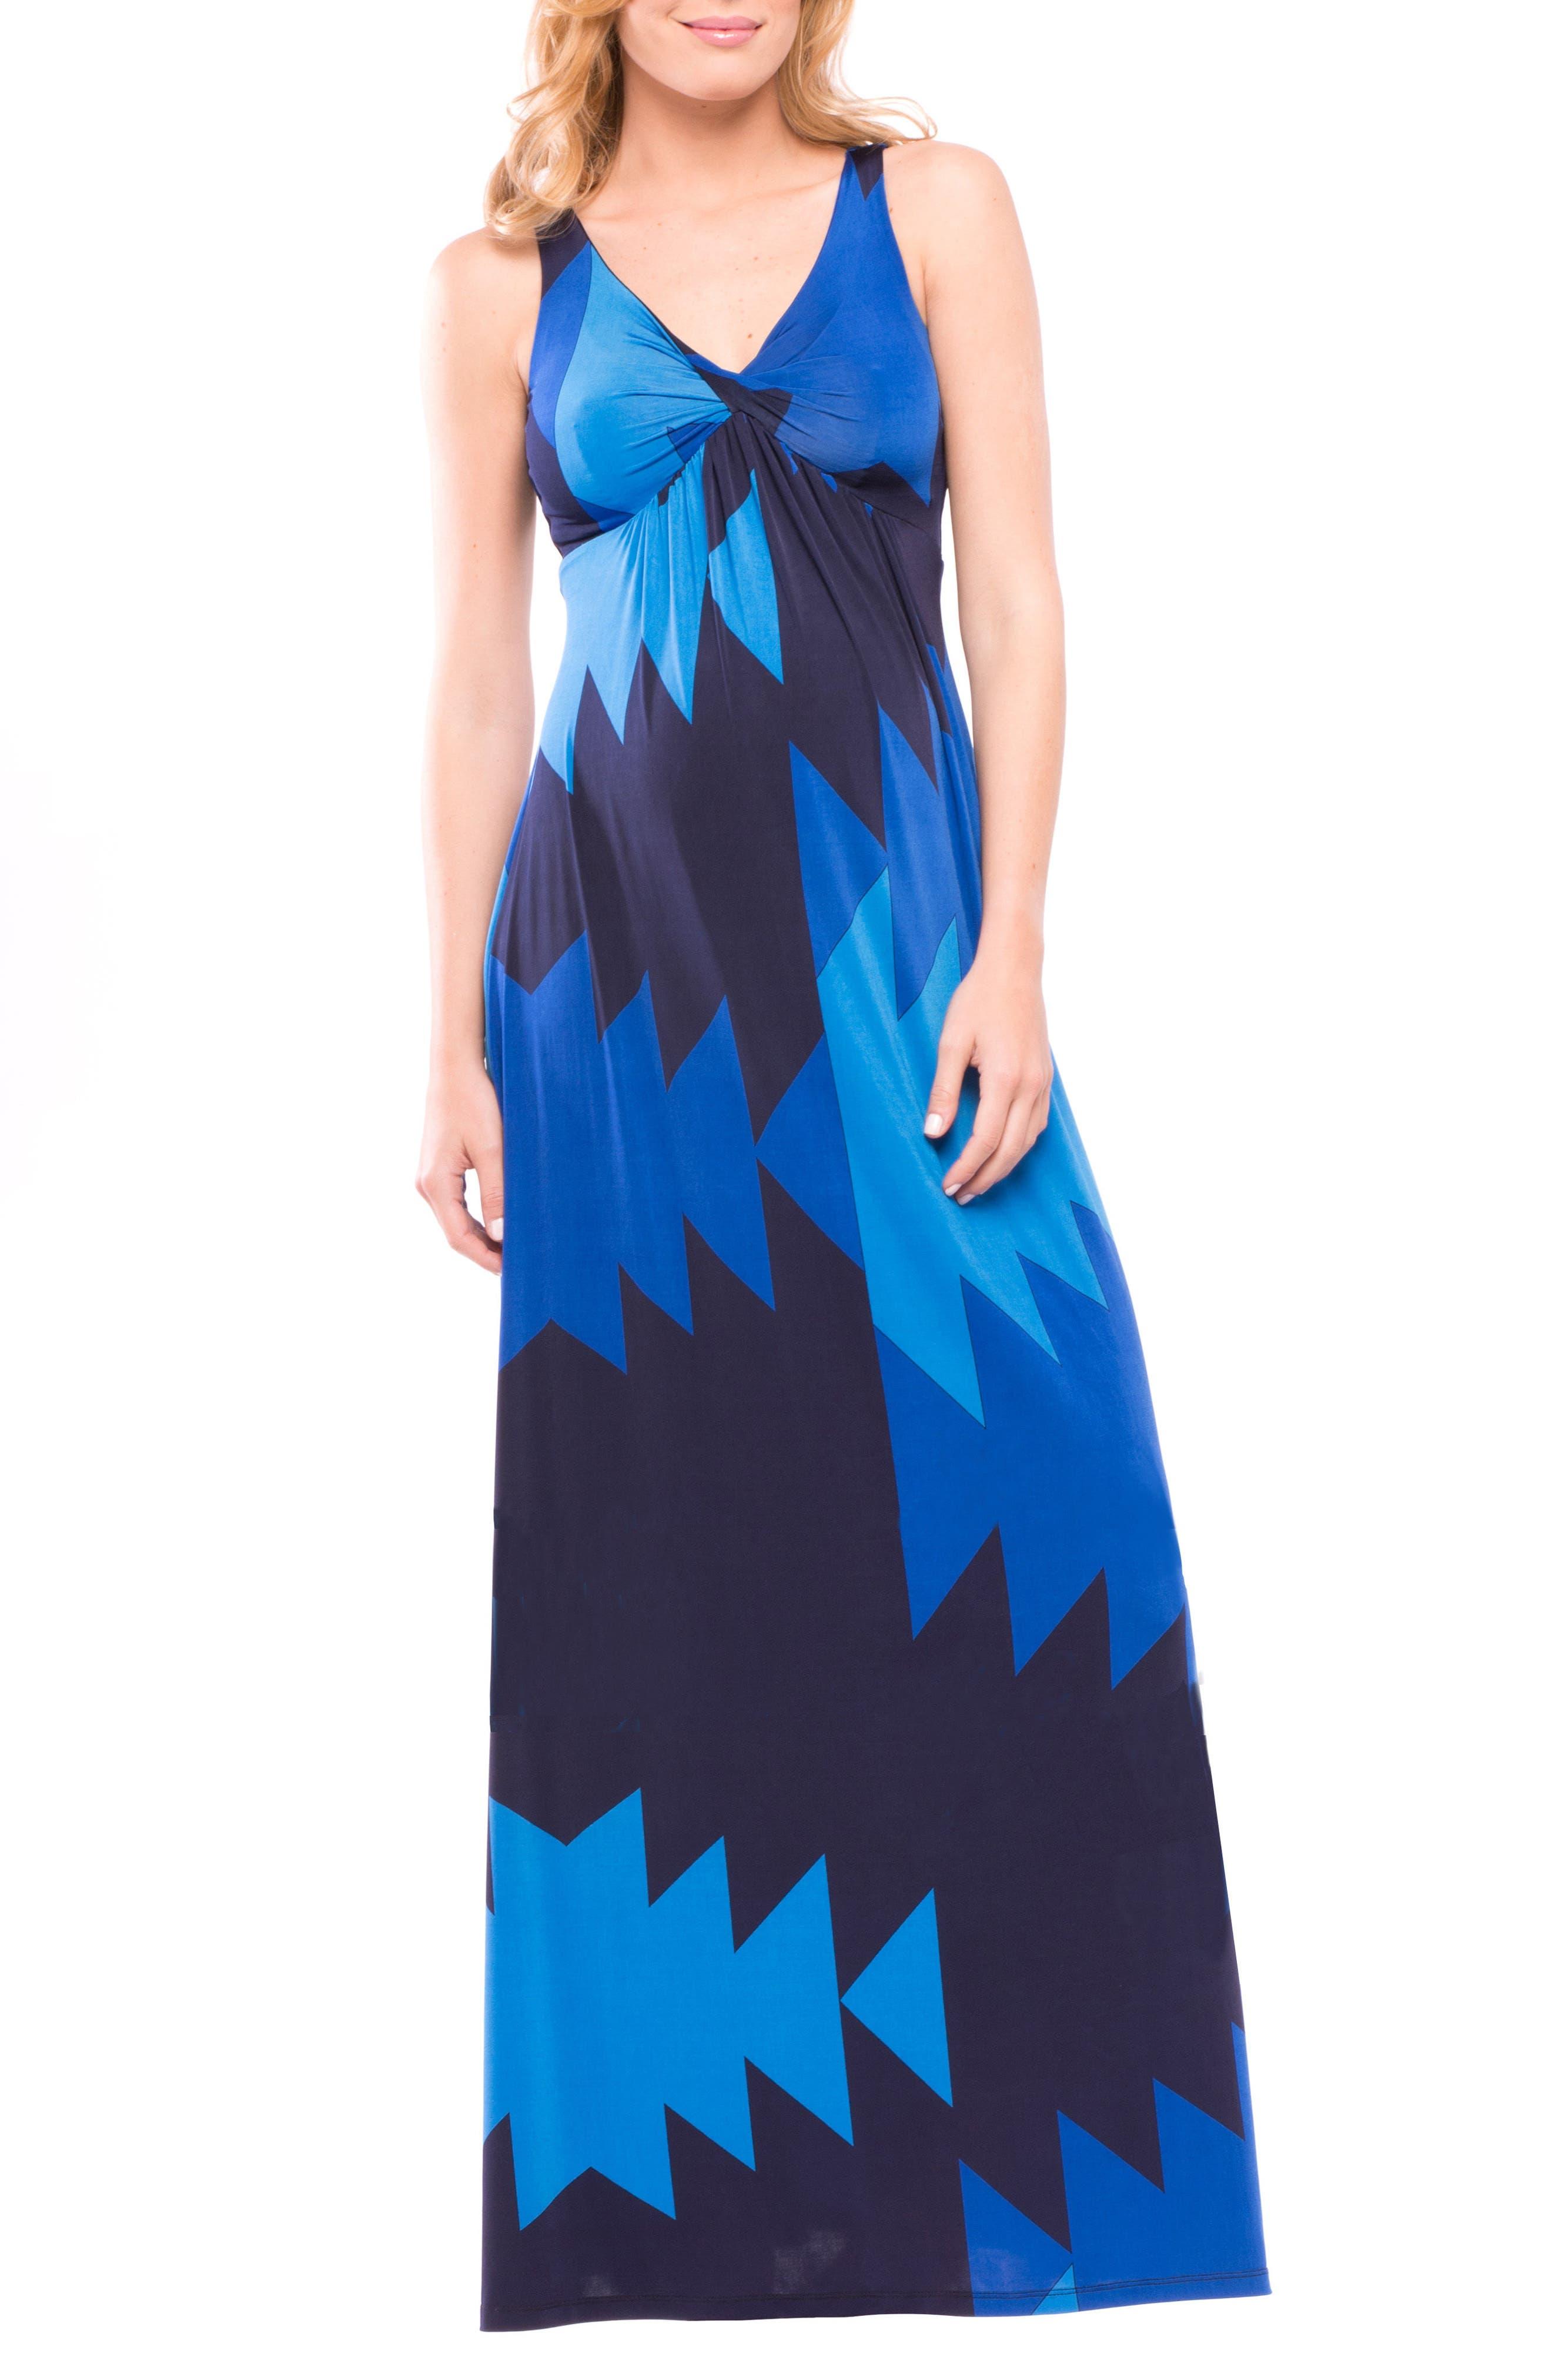 Olivia Sleeveless Maternity Maxi Dress,                             Alternate thumbnail 2, color,                             BLUE AZTEC PRINT